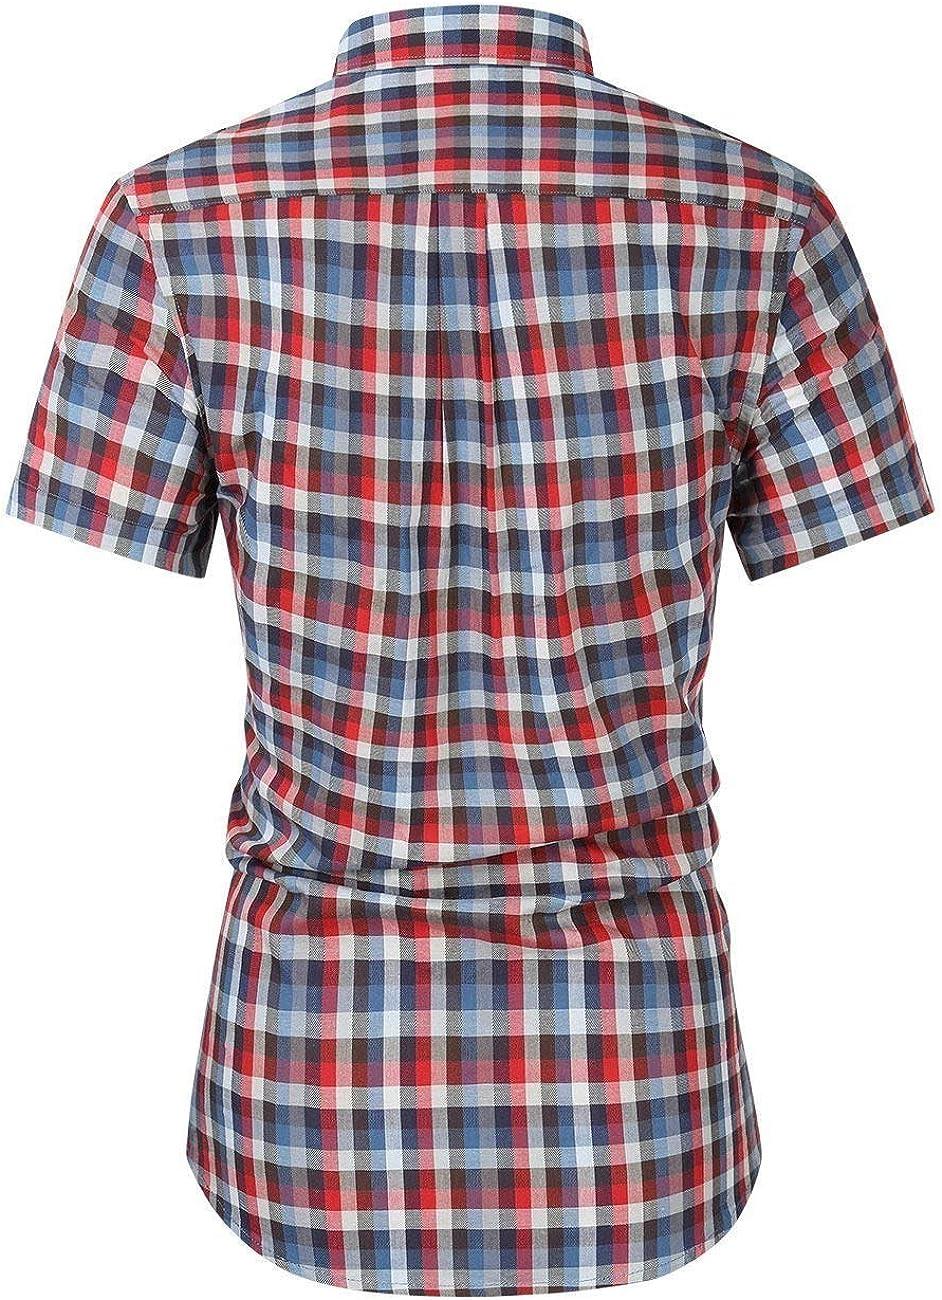 Comaba Mens Half Sleeve Leisure Cotton Plus-Size Turn-Down Collar Oxford Shirt